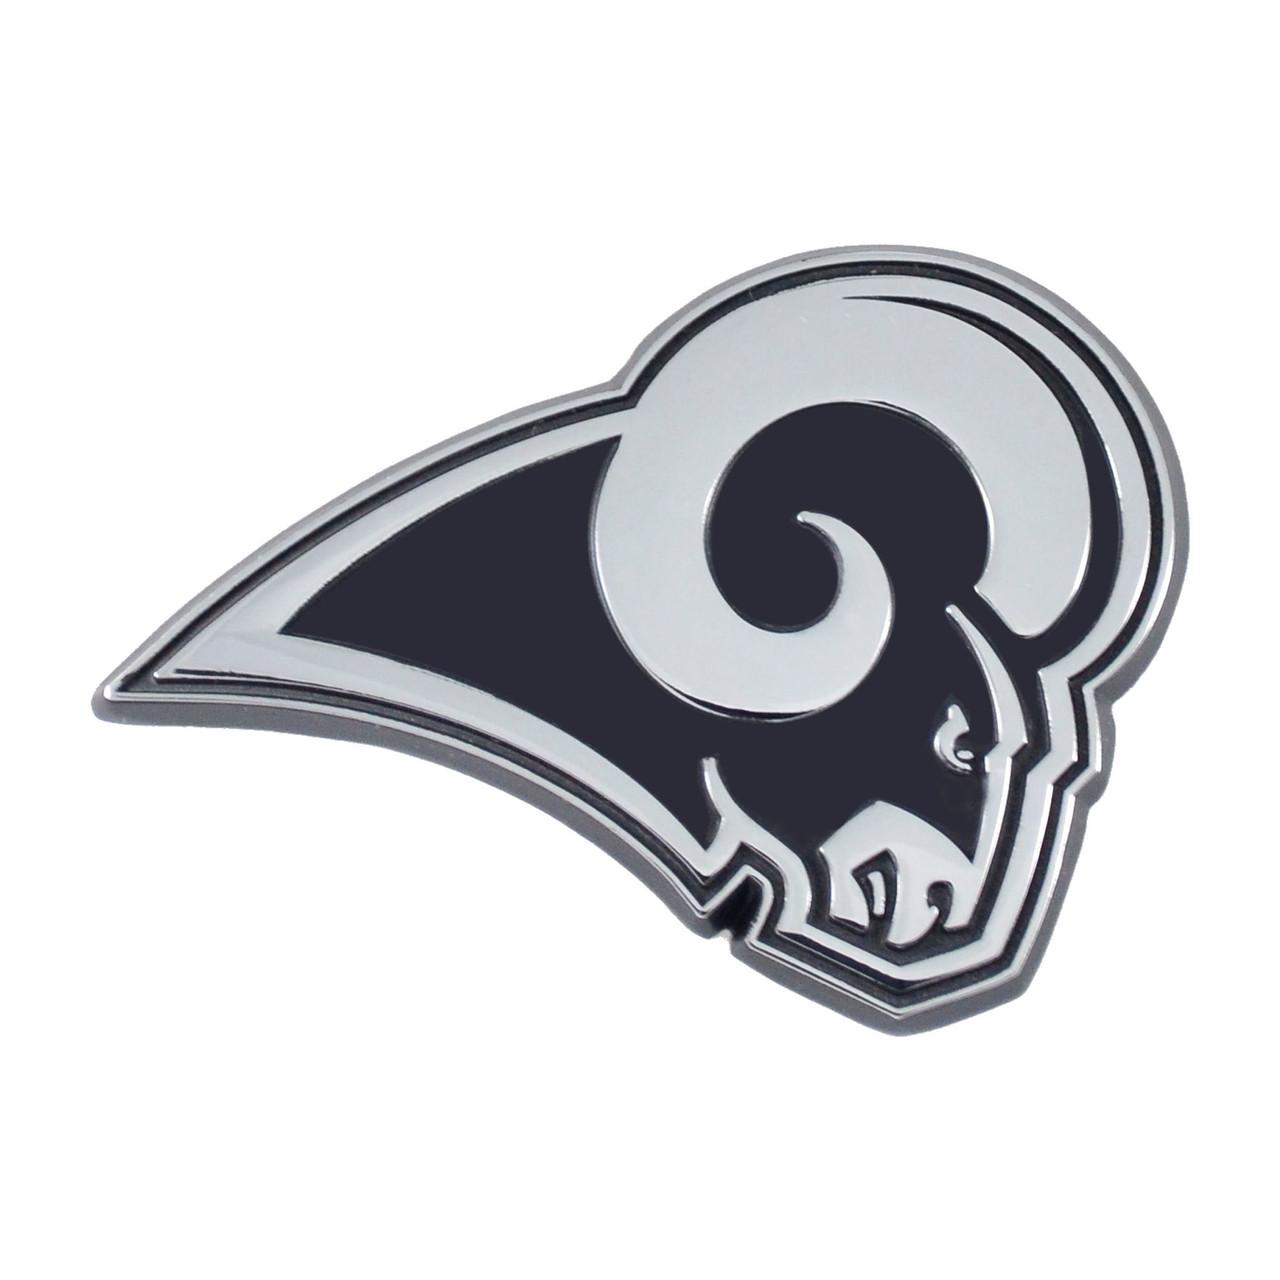 Los Angeles Rams Auto Emblem Premium Metal Chrome